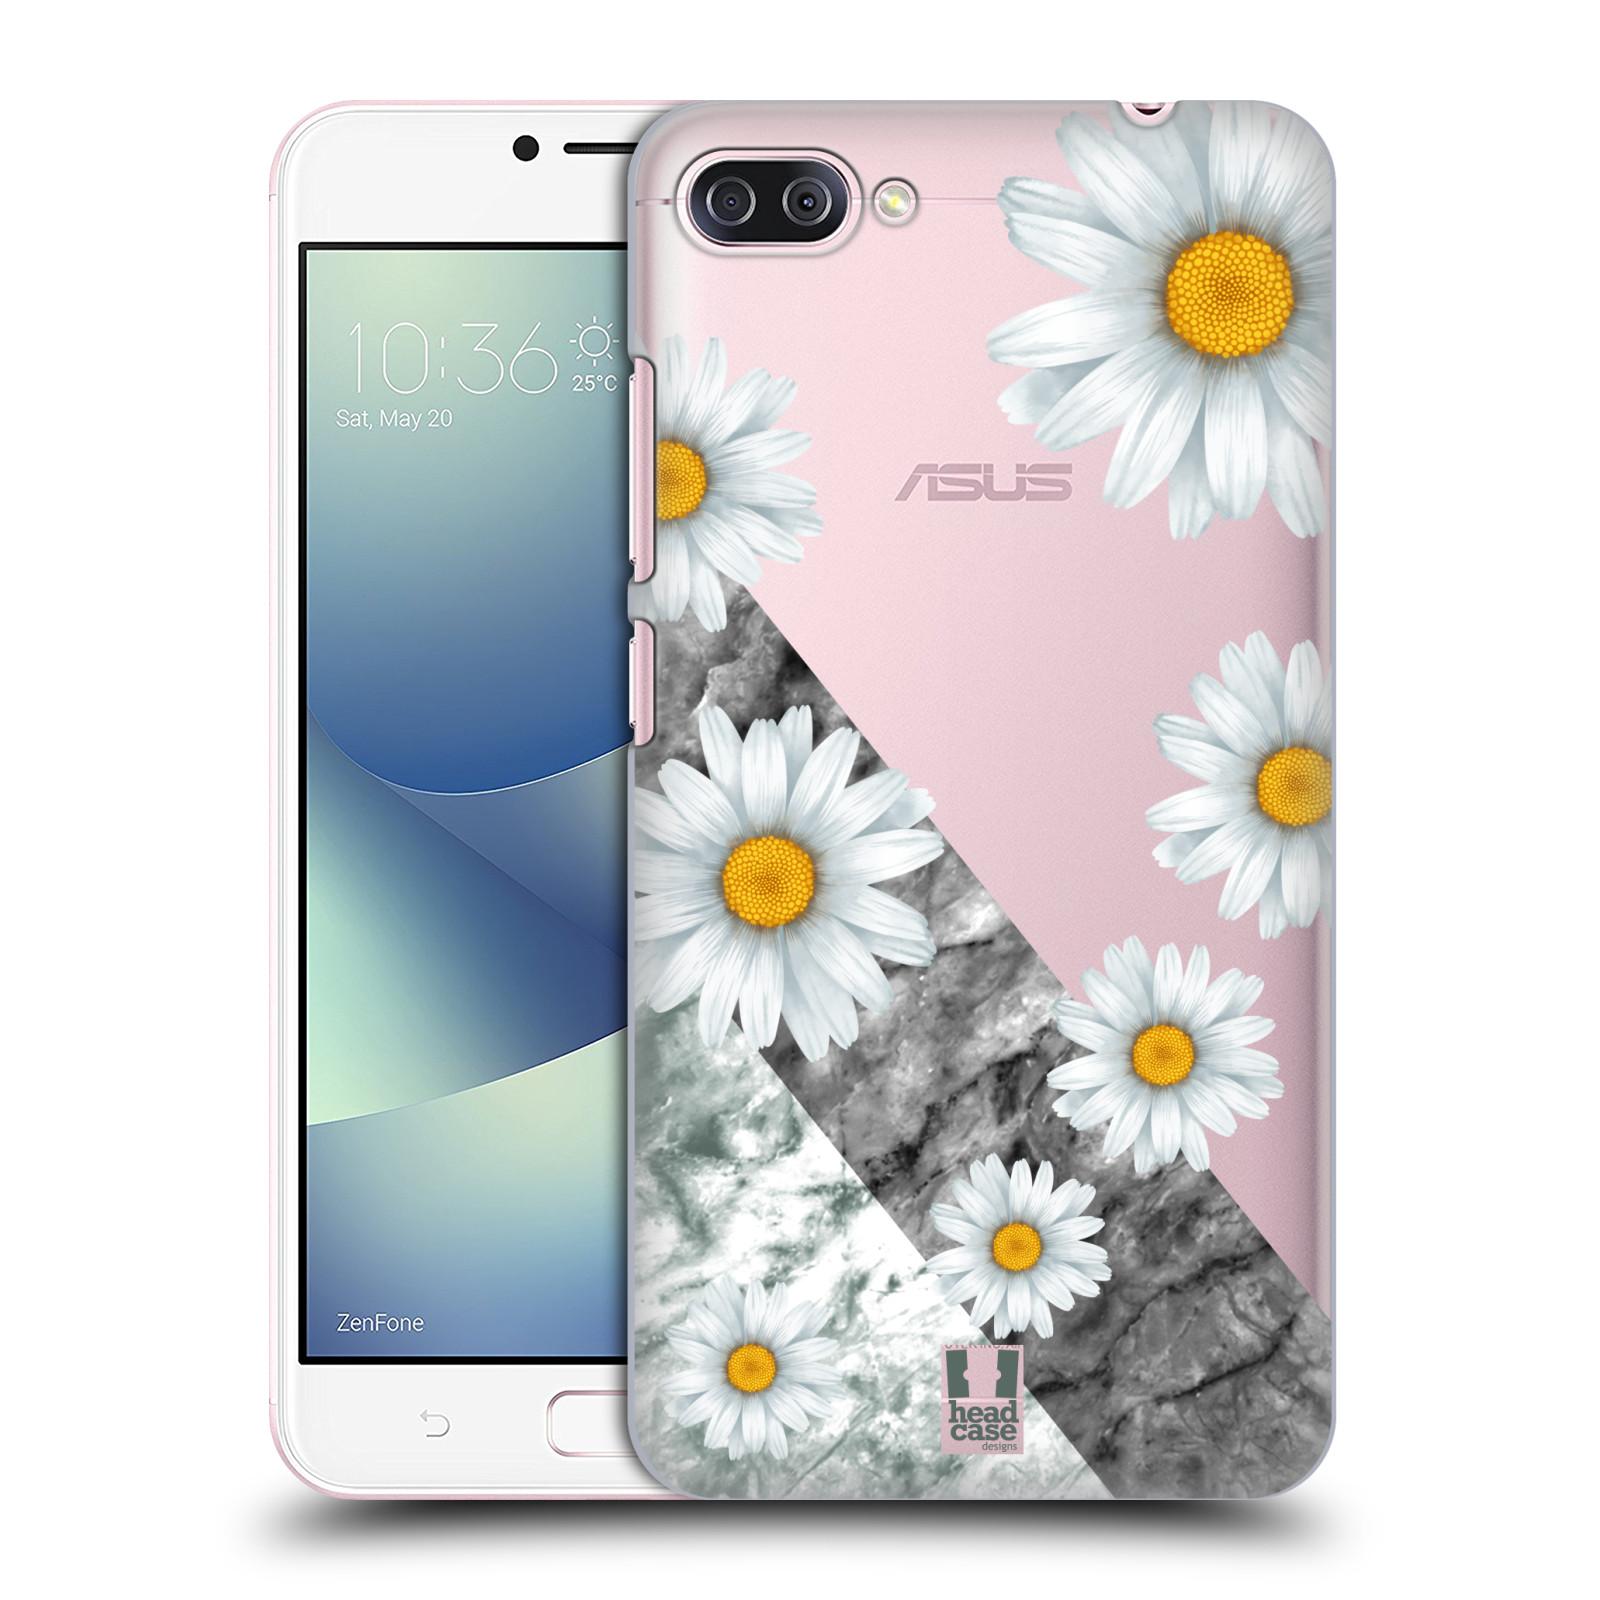 HEAD CASE plastový obal na mobil Asus Zenfone 4 MAX ZC554KL květina sedmikráska a mramor